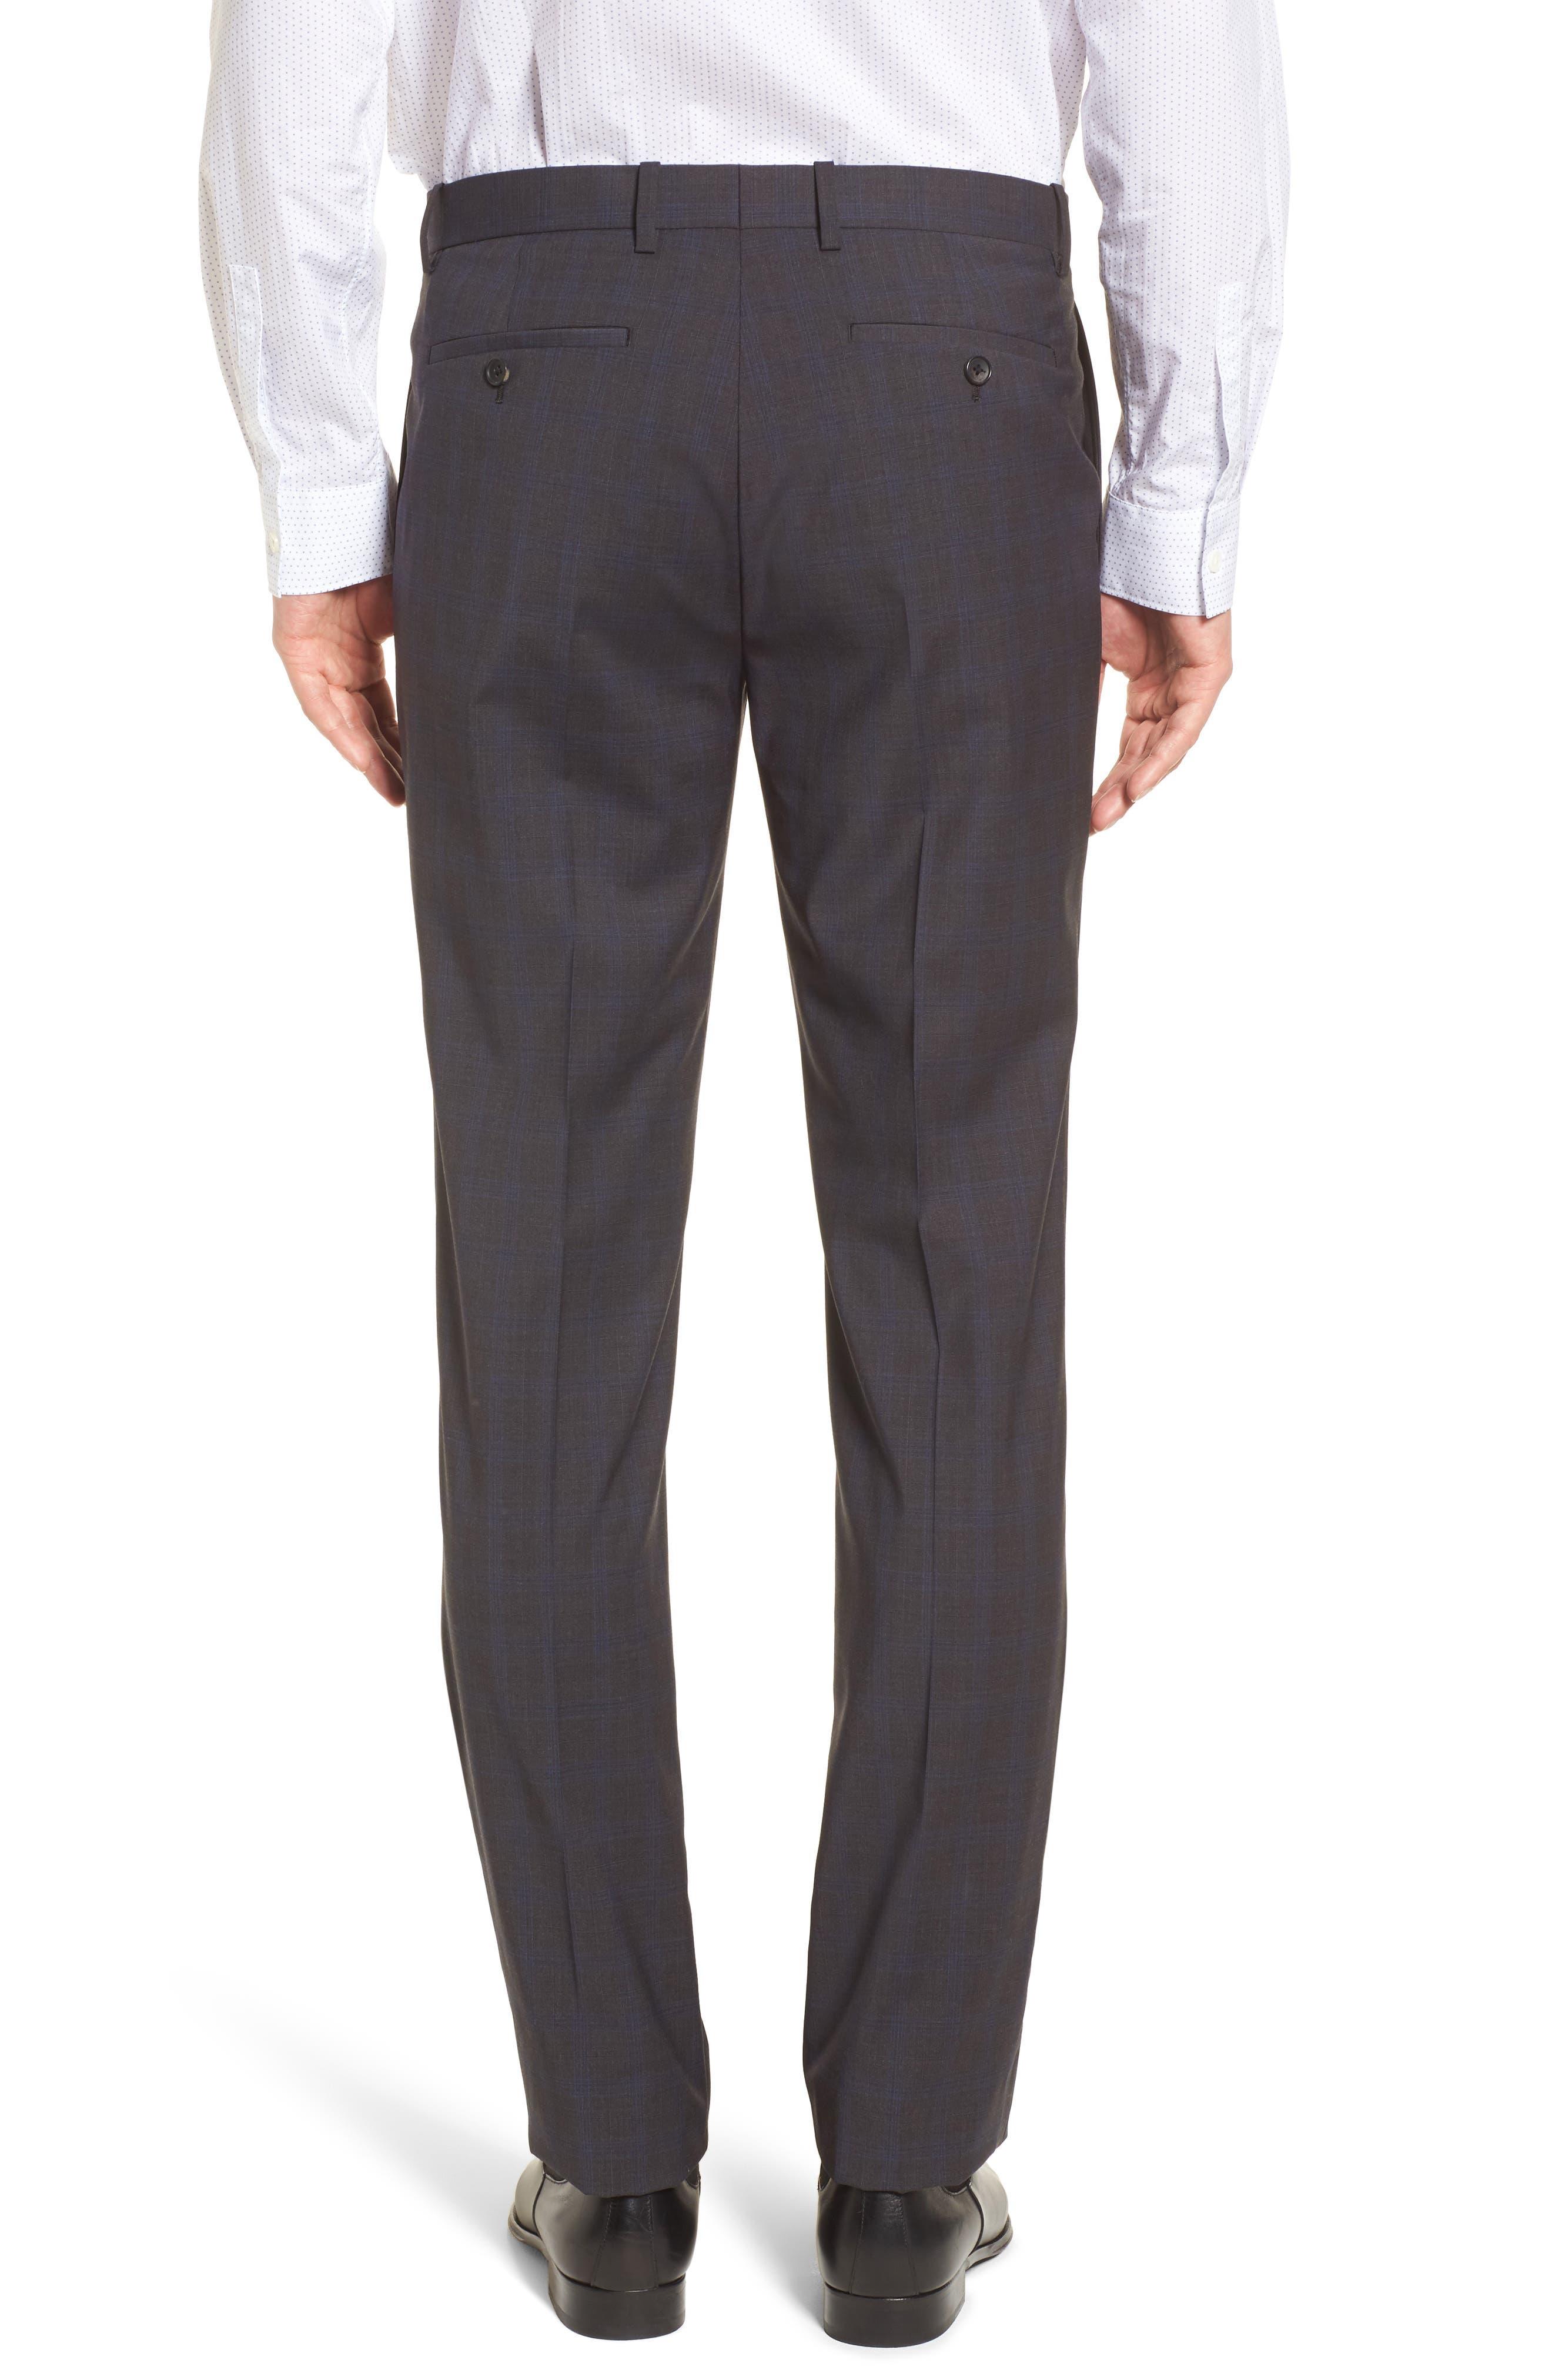 Marlo Trim Fit Tonal Plaid Trousers,                             Alternate thumbnail 2, color,                             053